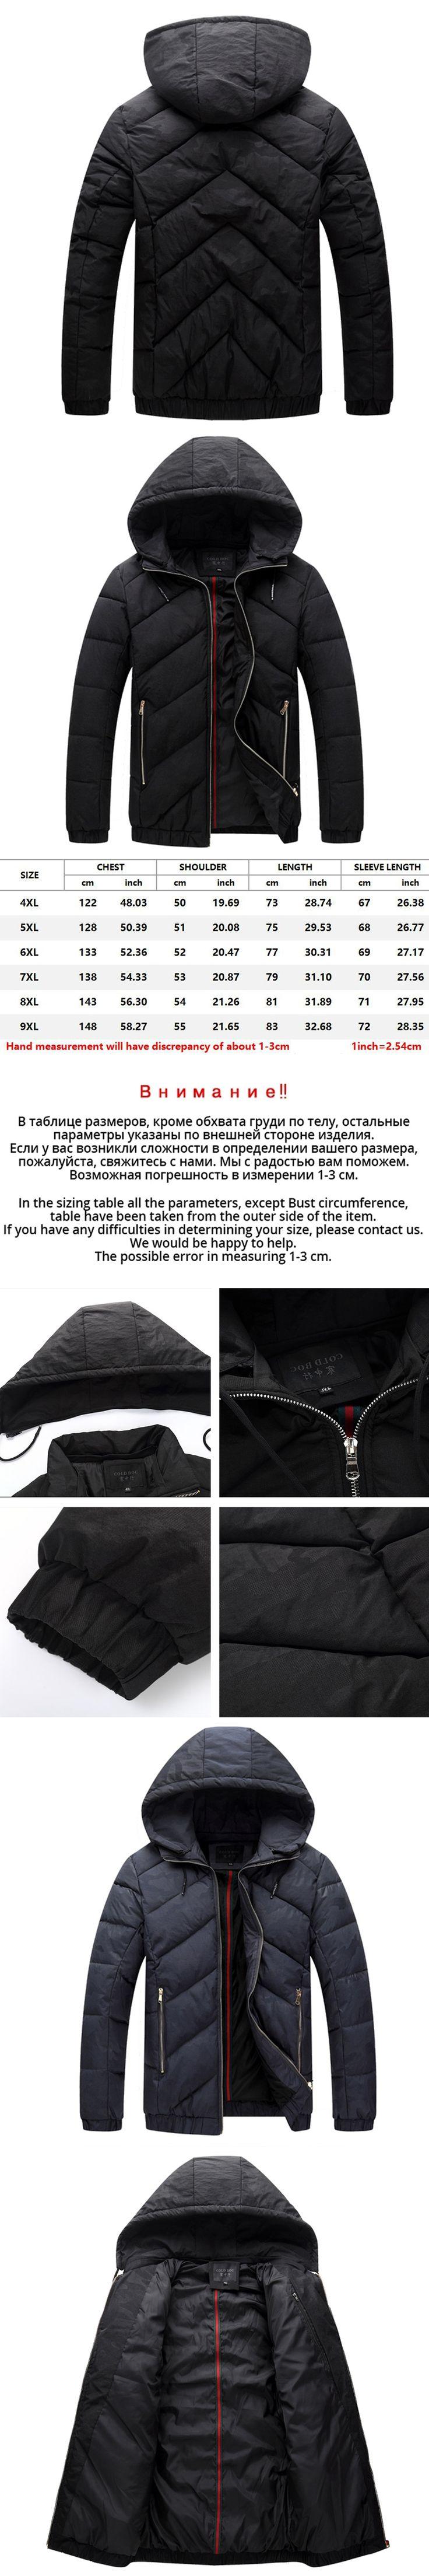 4XL-9XL Good Winter Jackets Big Size Parkas Mens Black Hooded Thick Warm Cotton  Padded Snow Coat Jaqueta Masculina Inverno W12